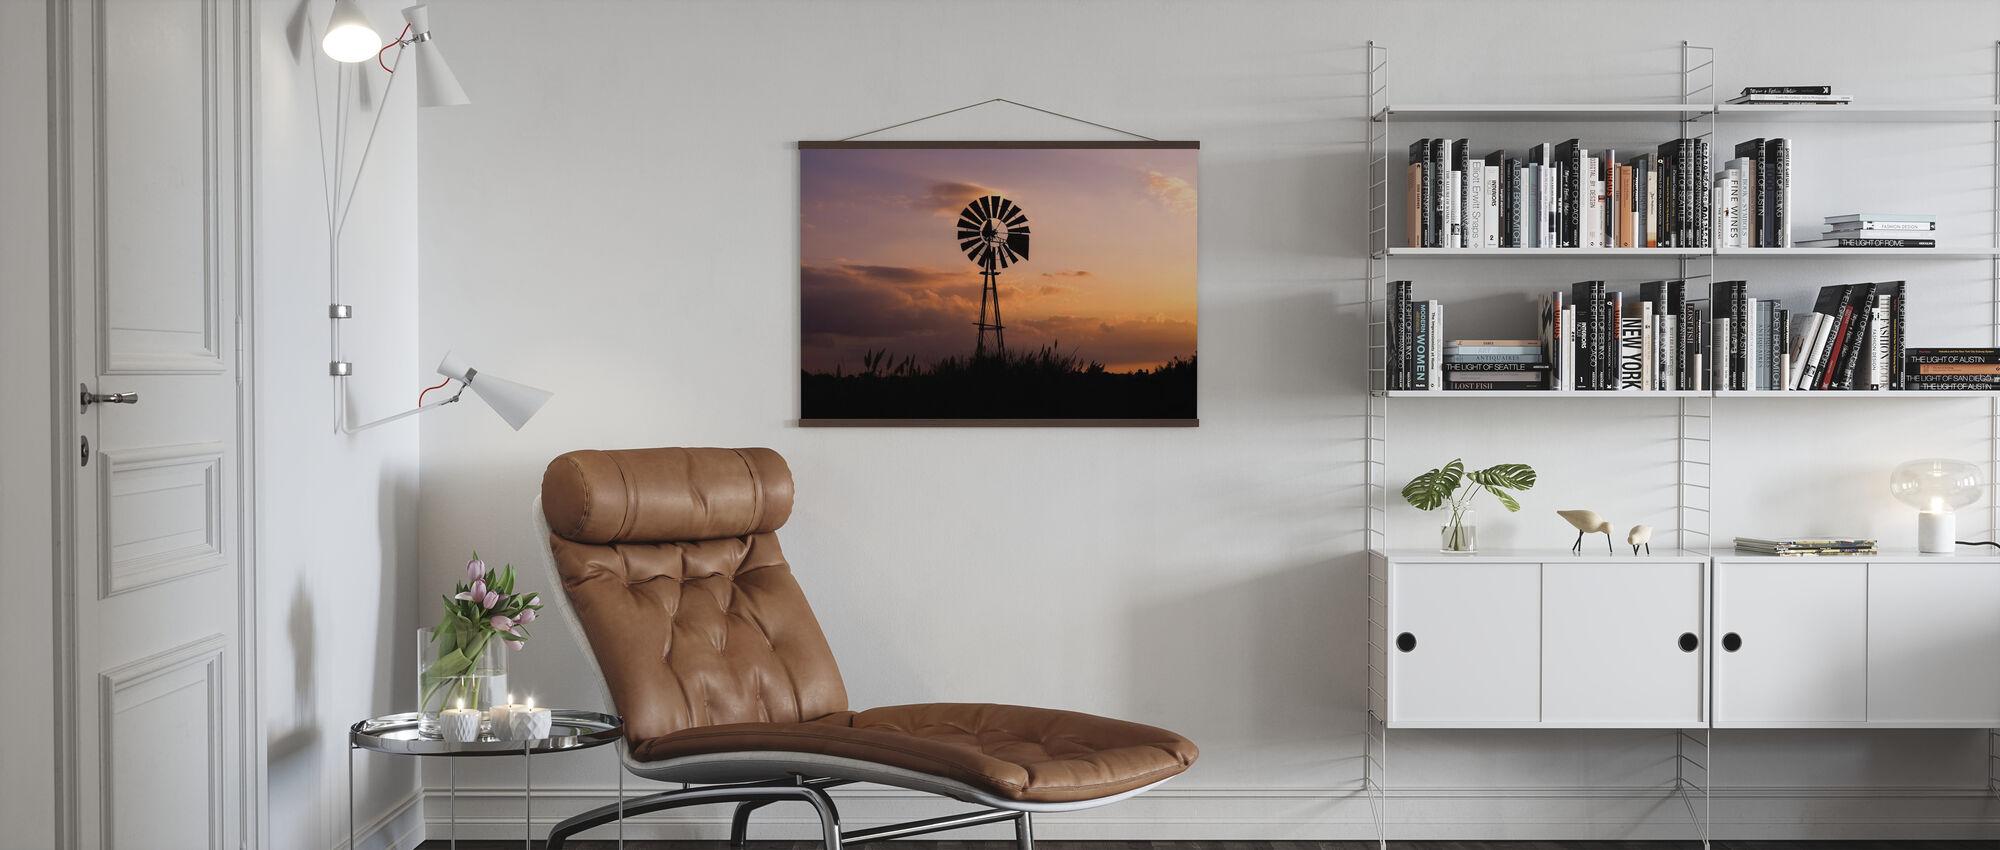 Windmill Sunset - Poster - Living Room